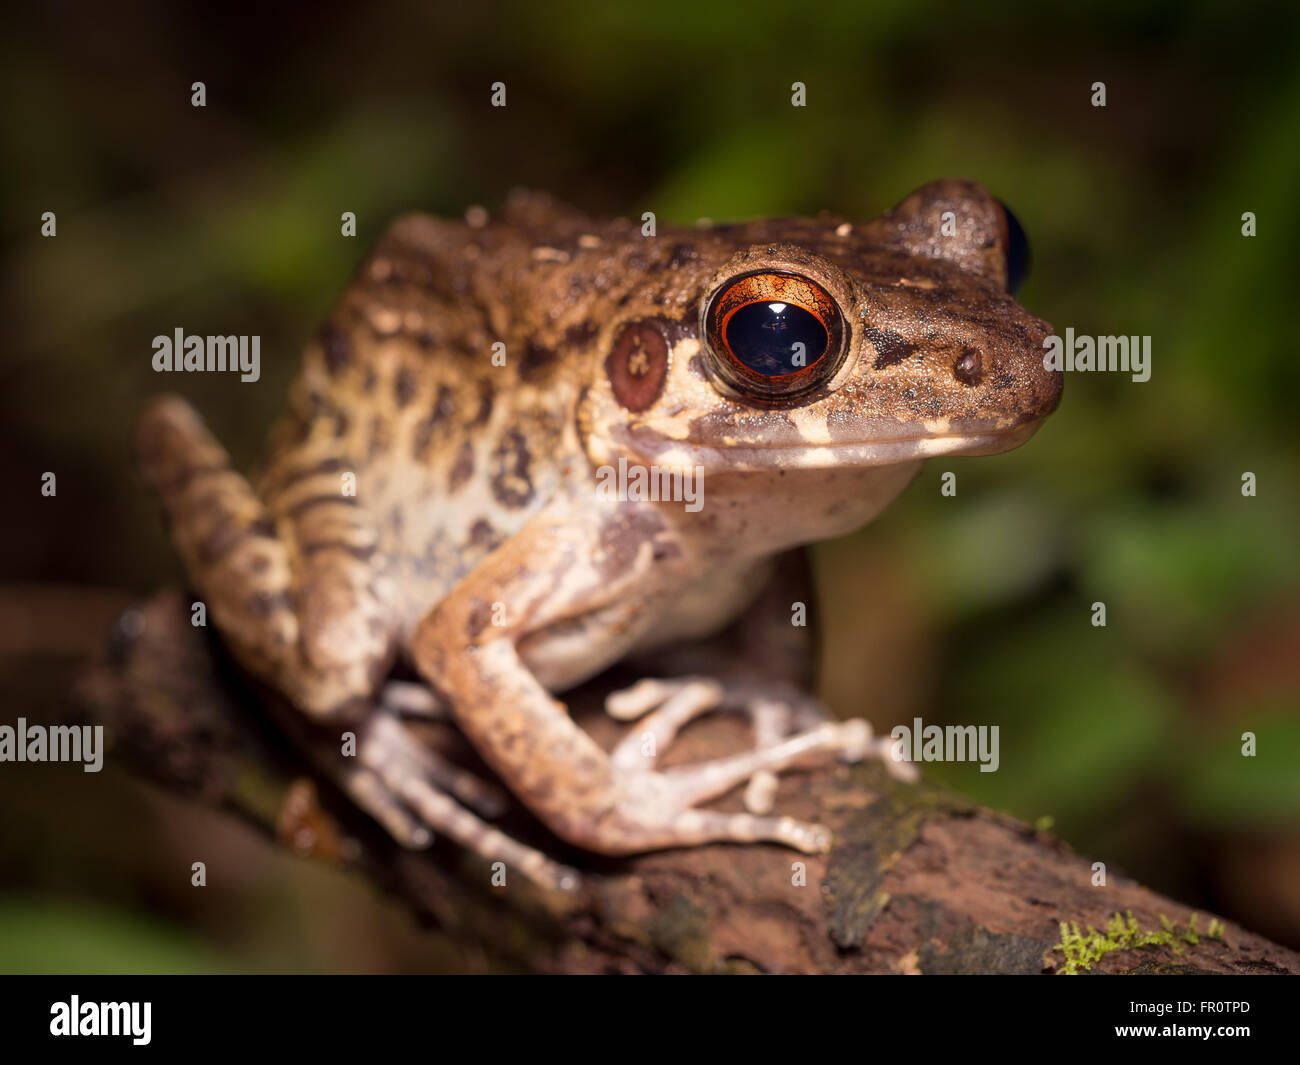 Rough-sided Frog (Hylarana glandulosa) Gunung Mulu, Borneo - Stock Image